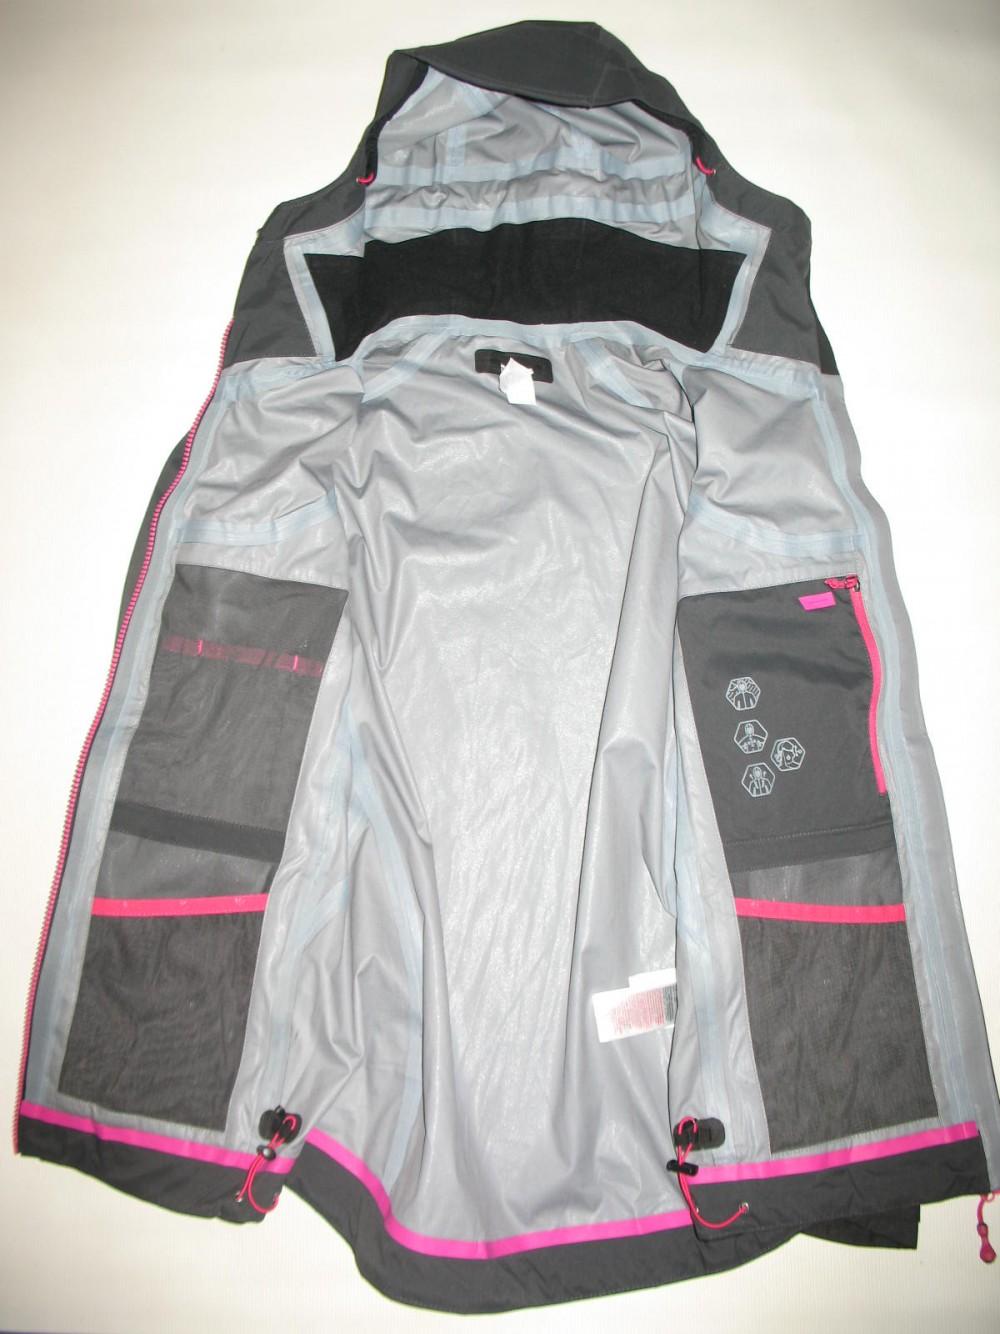 Куртка QUECHUA forclaz 900 l jacket lady (размер XS/S) - 8